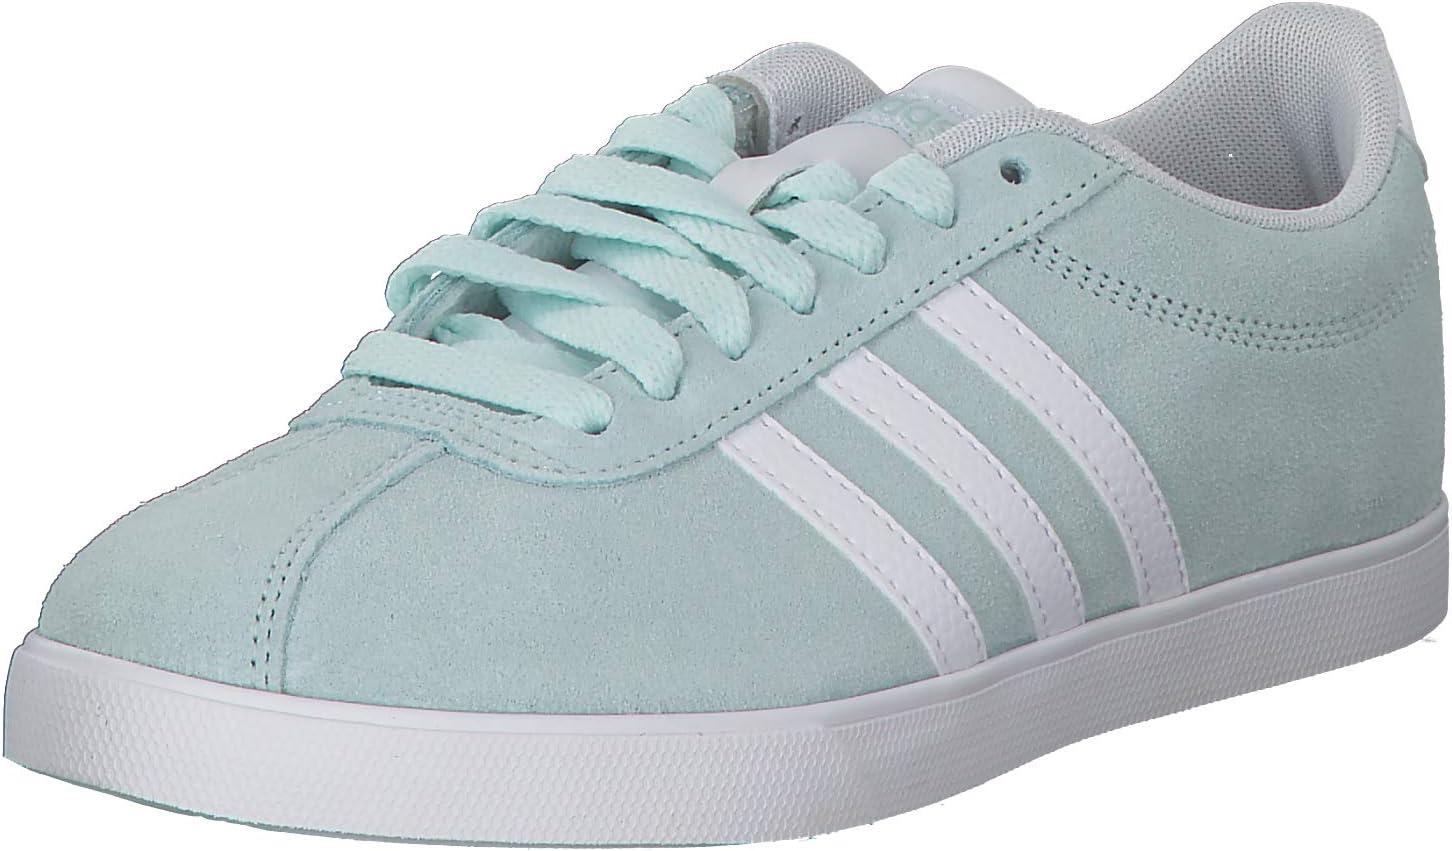 Adidas AG Sneakerwand Q2 Icemin Ftwwht Lgrani